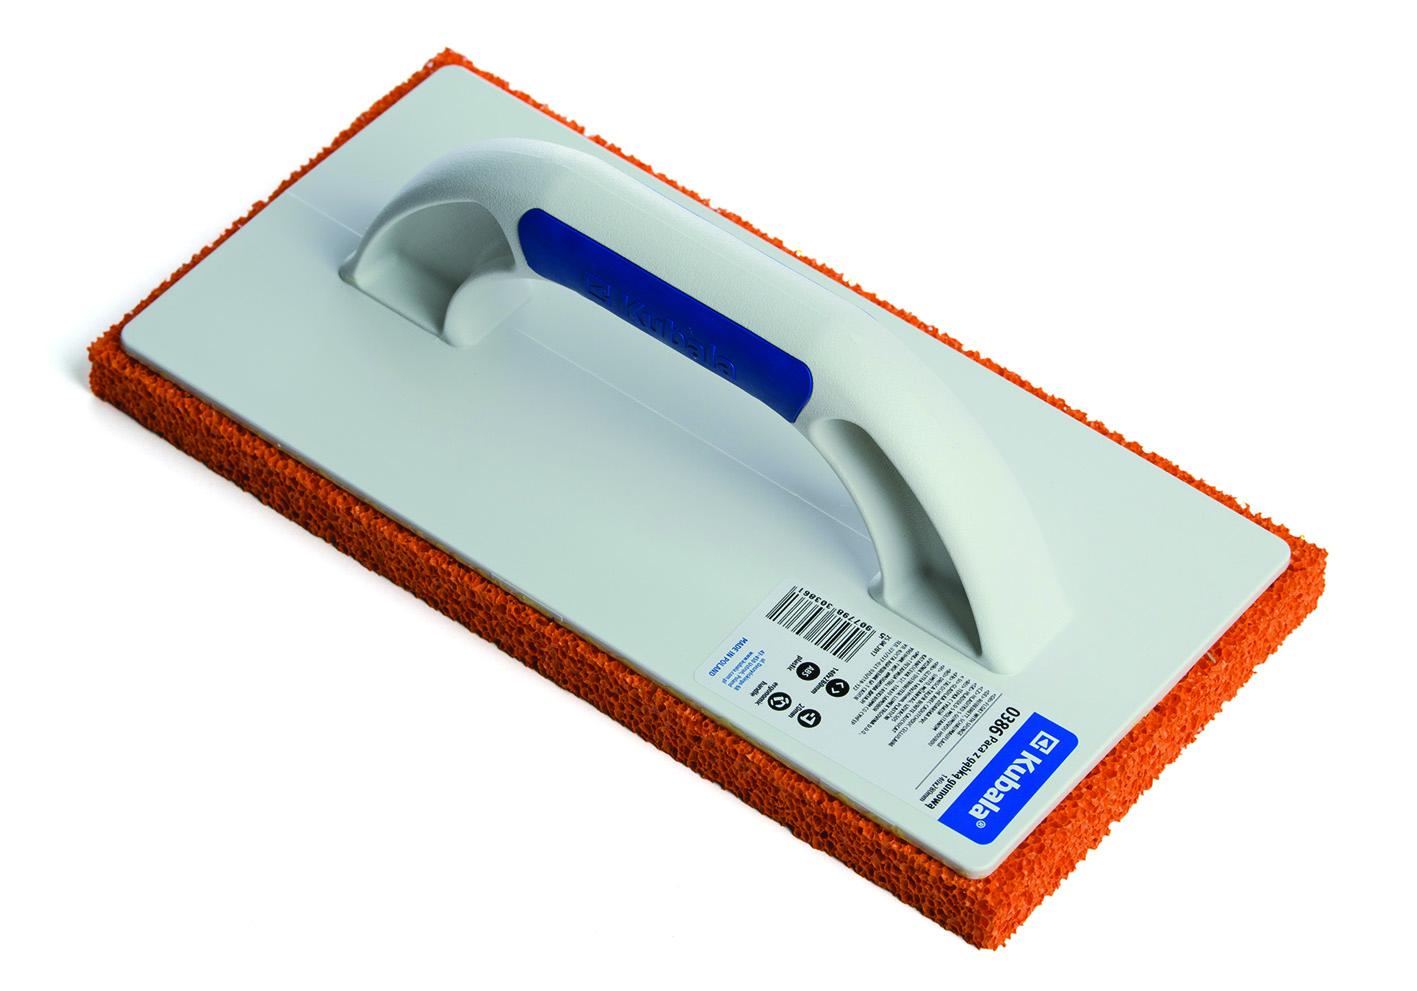 Plastični gleter sa gumenom spužvom i soft drškom, 140x280 mm